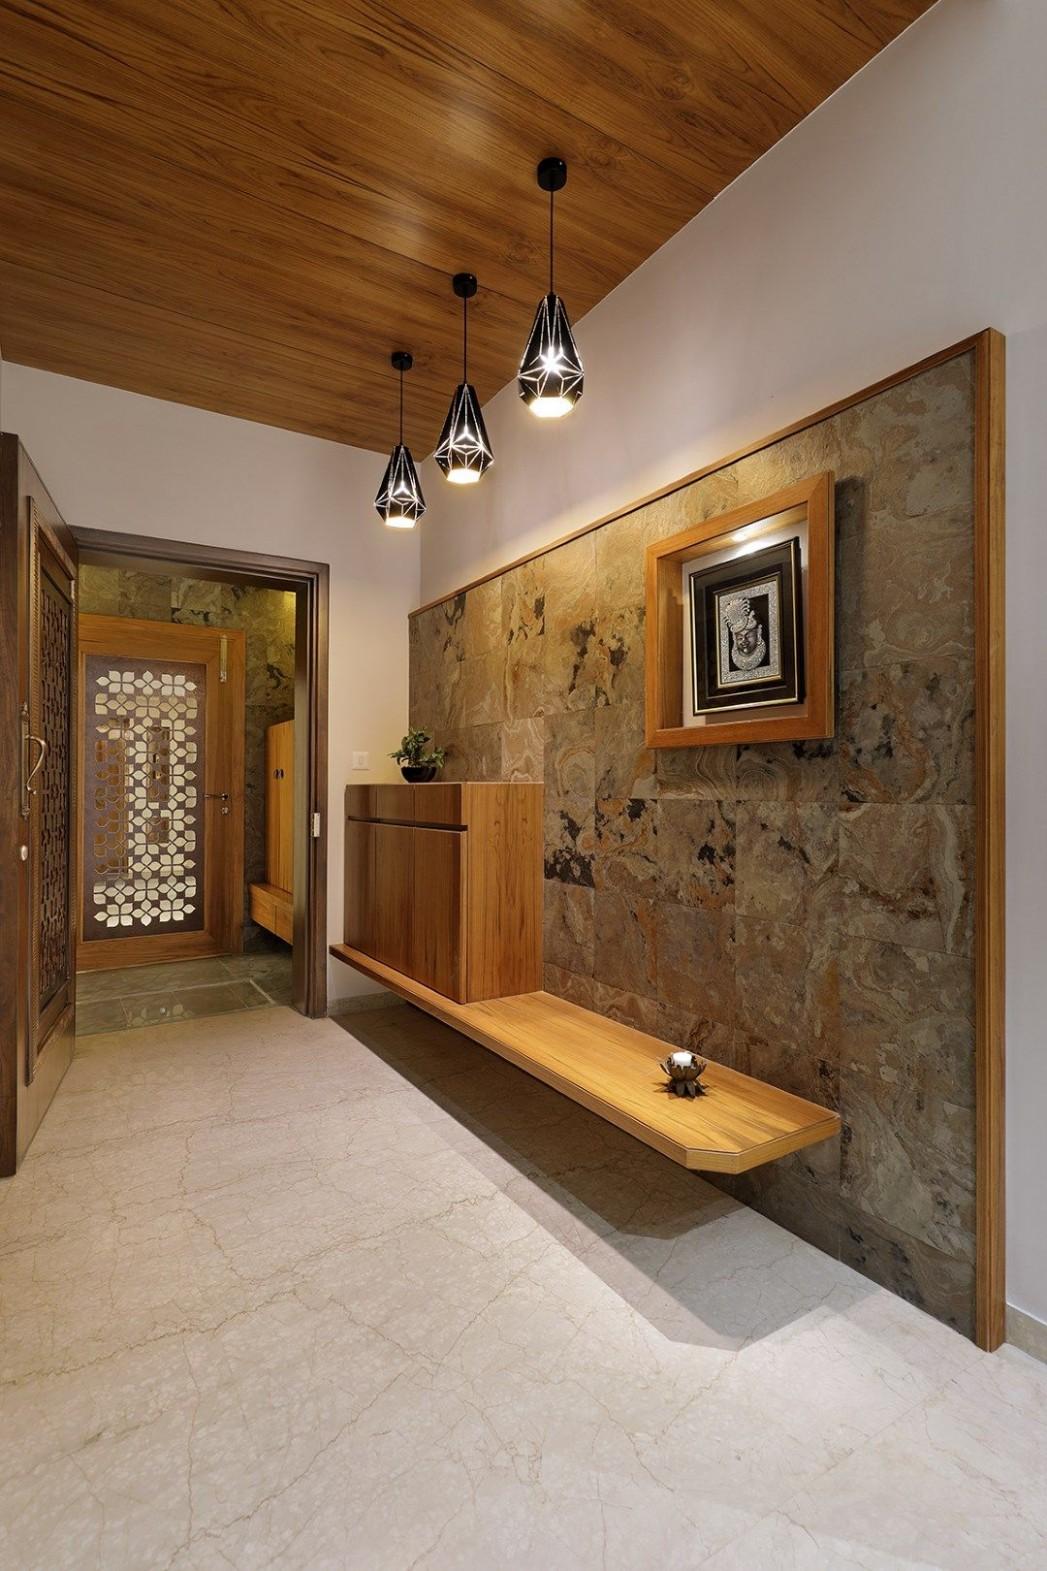 Floral Pattern Inspires Apartment Interiors  Studio 11 - The  - Apartment Entrance Design